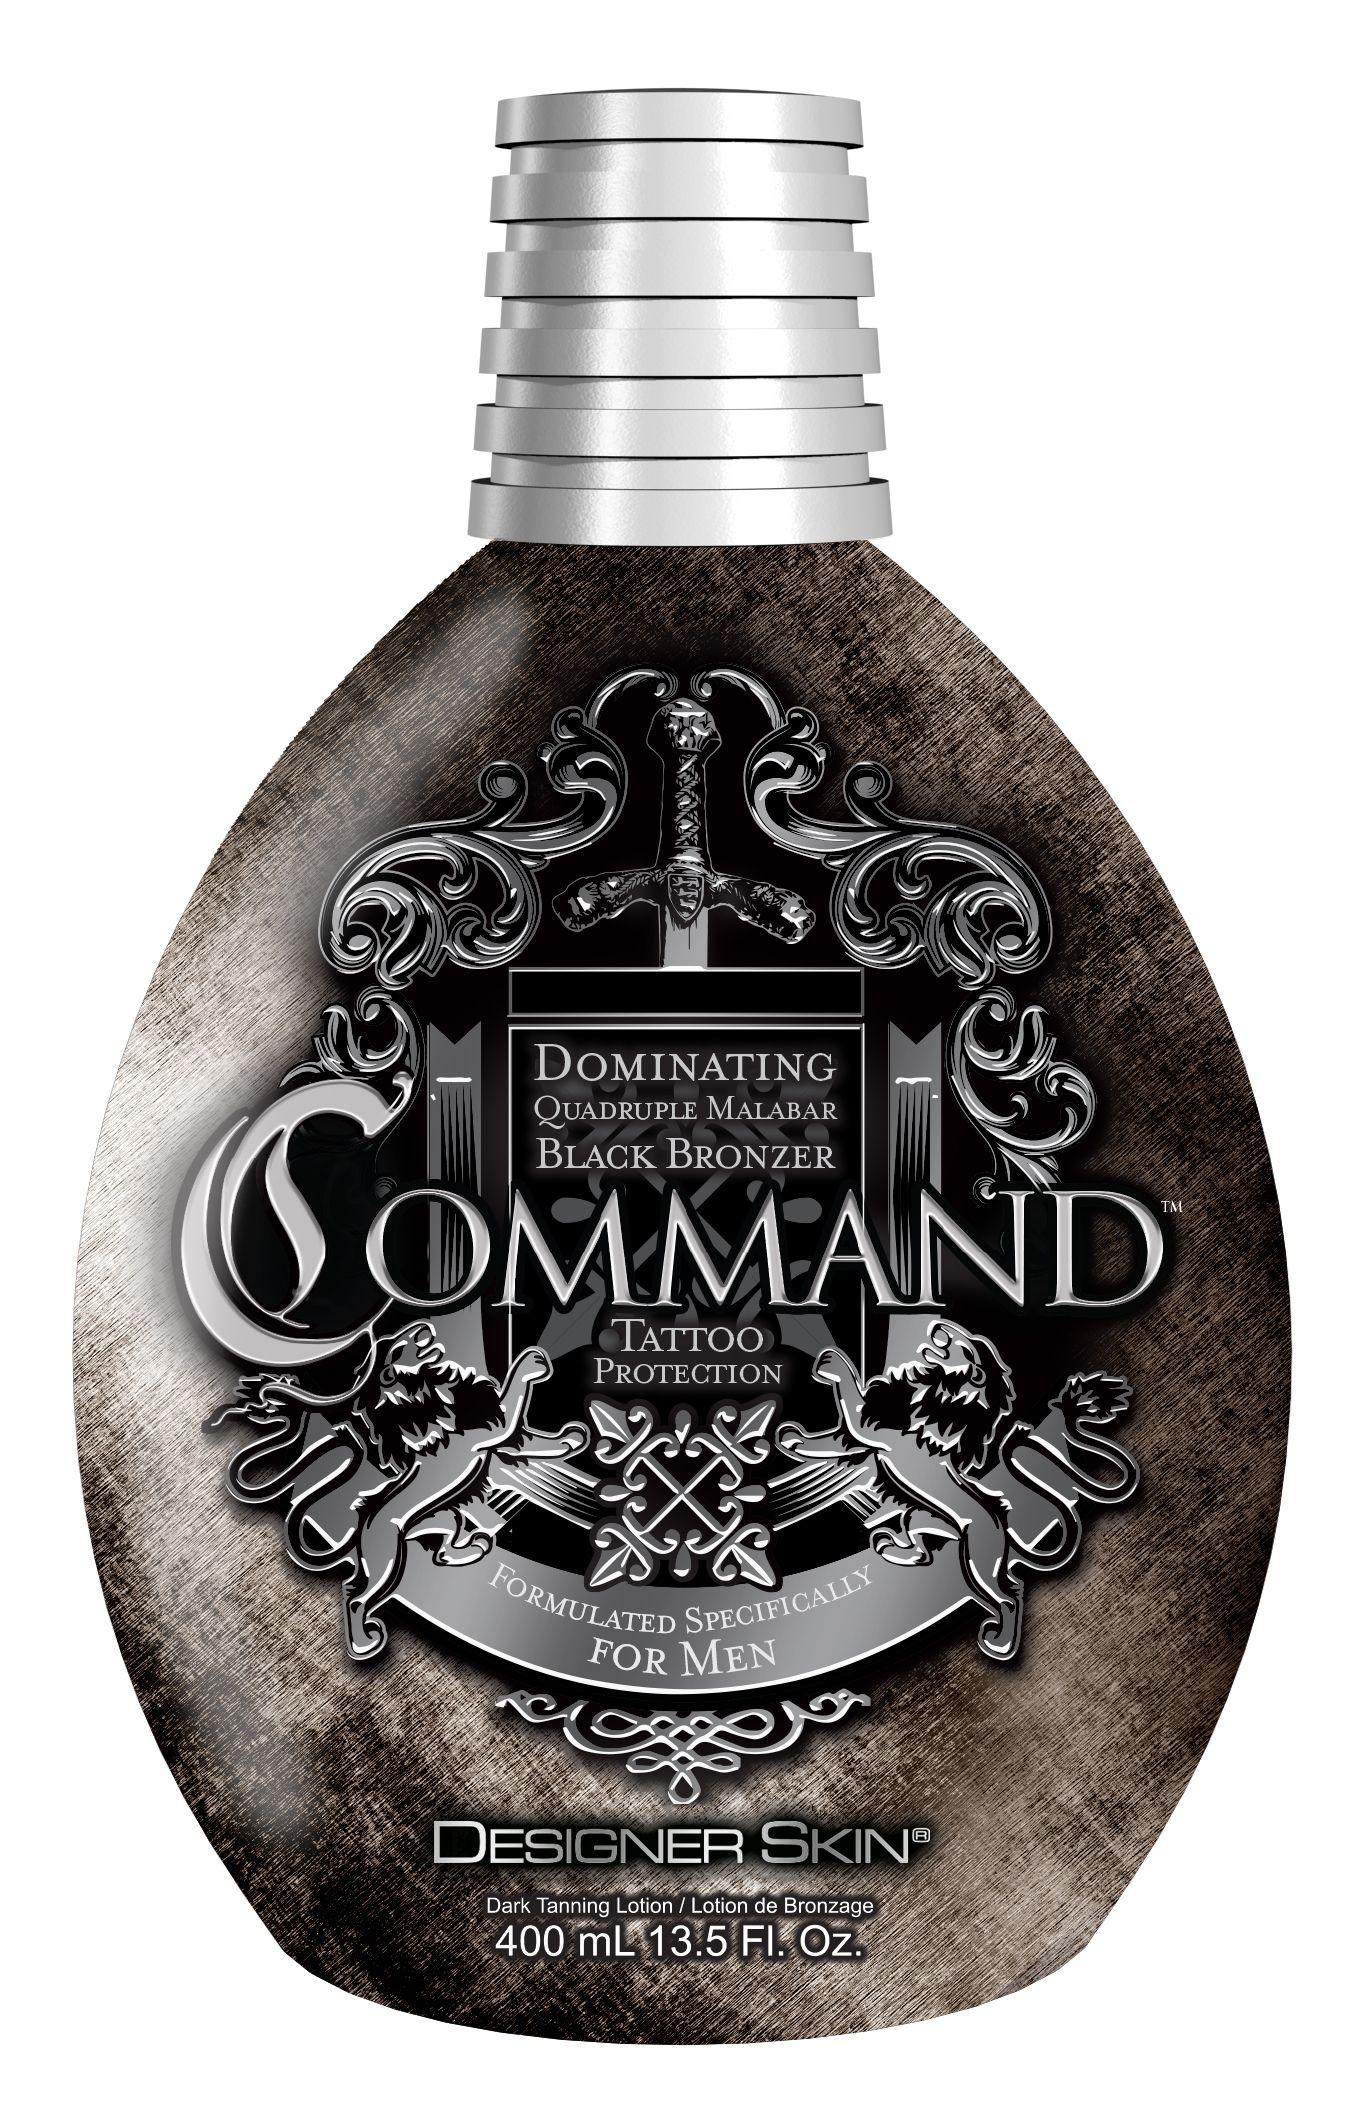 Command 2017 Designer Skin Designer Skin Tanning Lotion Designer Skin Tanning Lotion